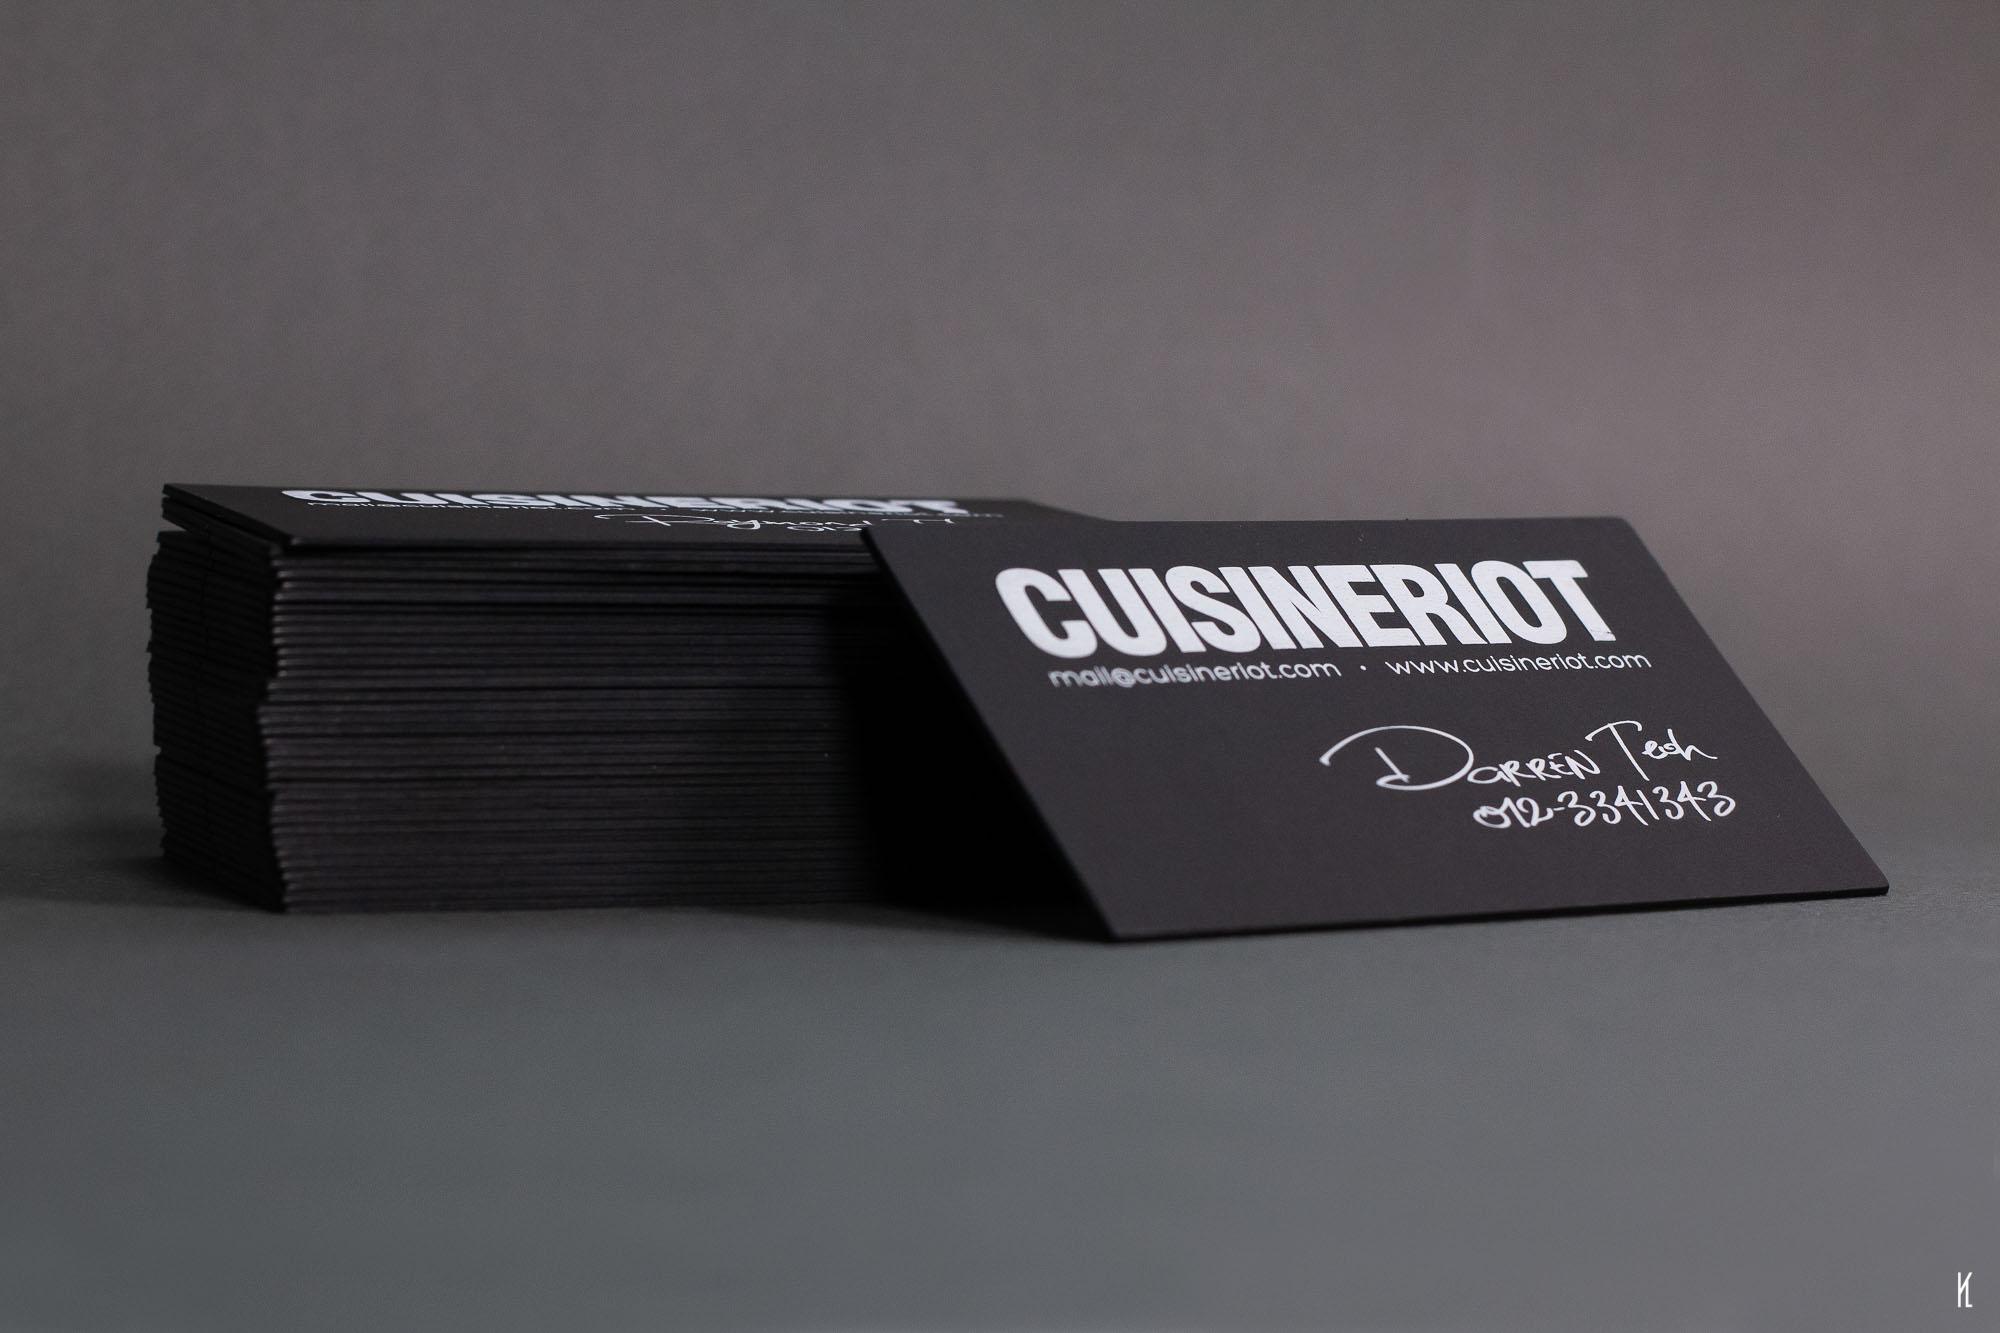 Triplex Namecards for Cuisine Riot